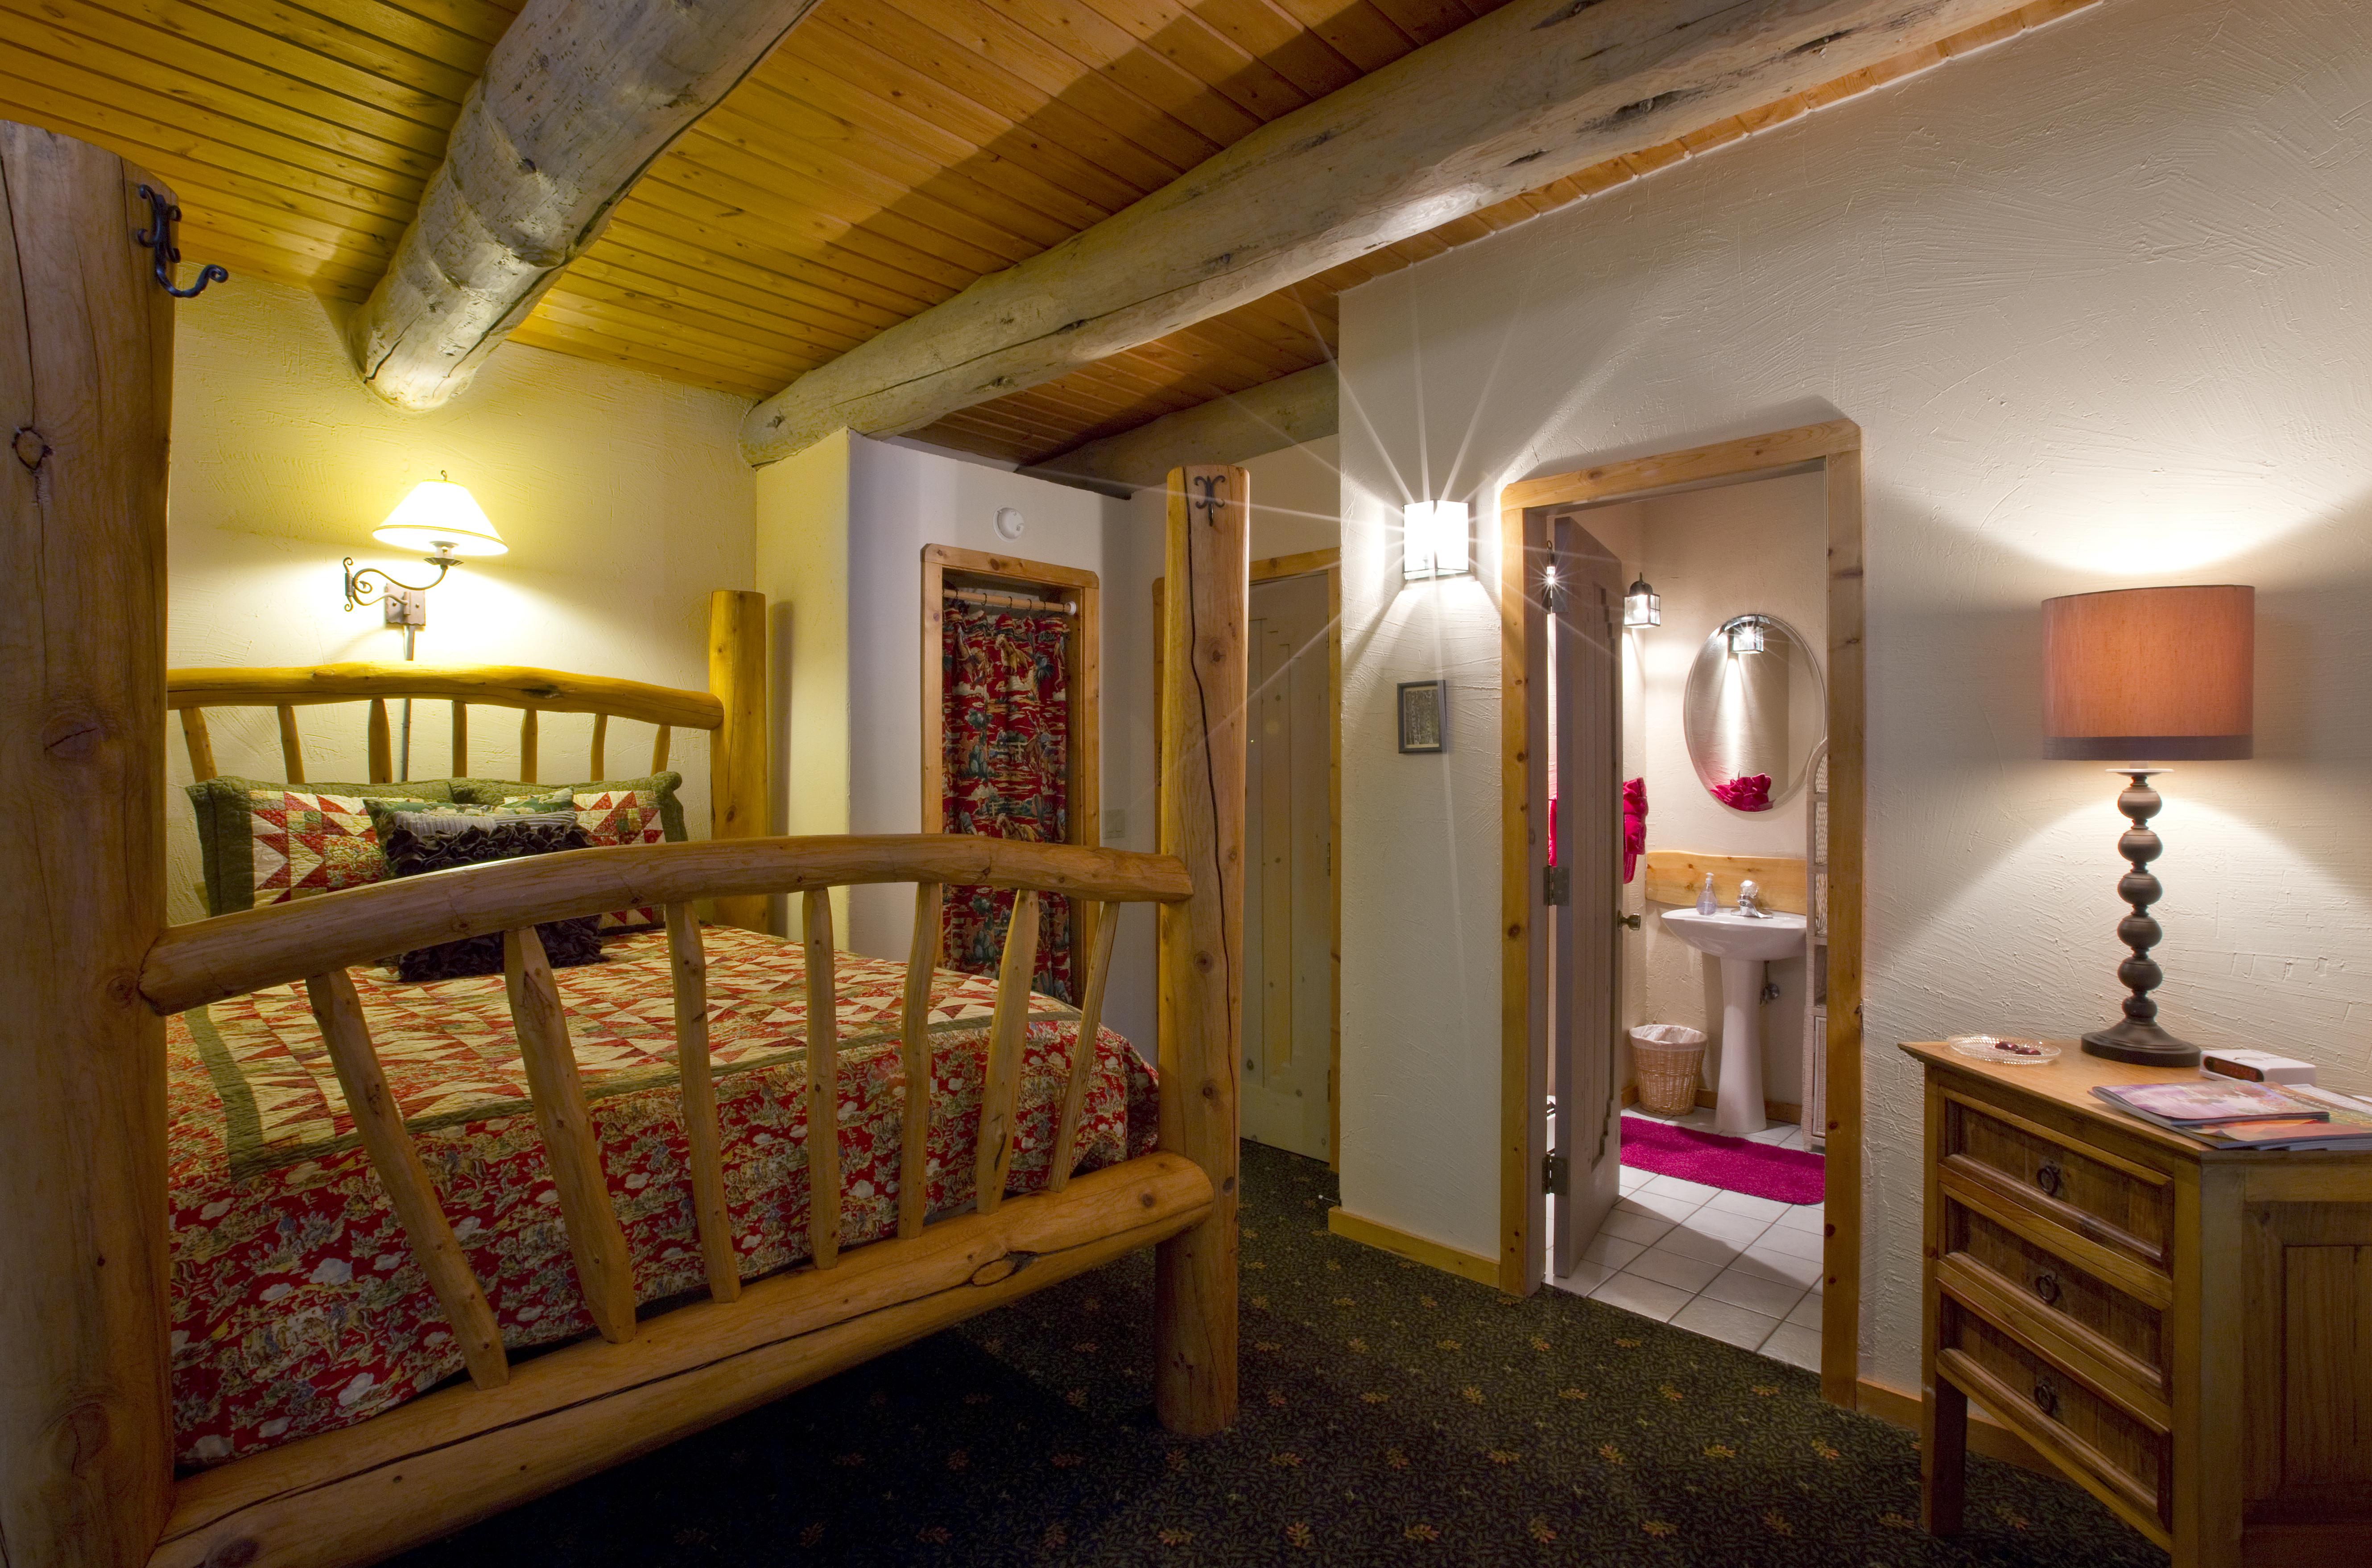 Mariposa B&B Guest Room 1